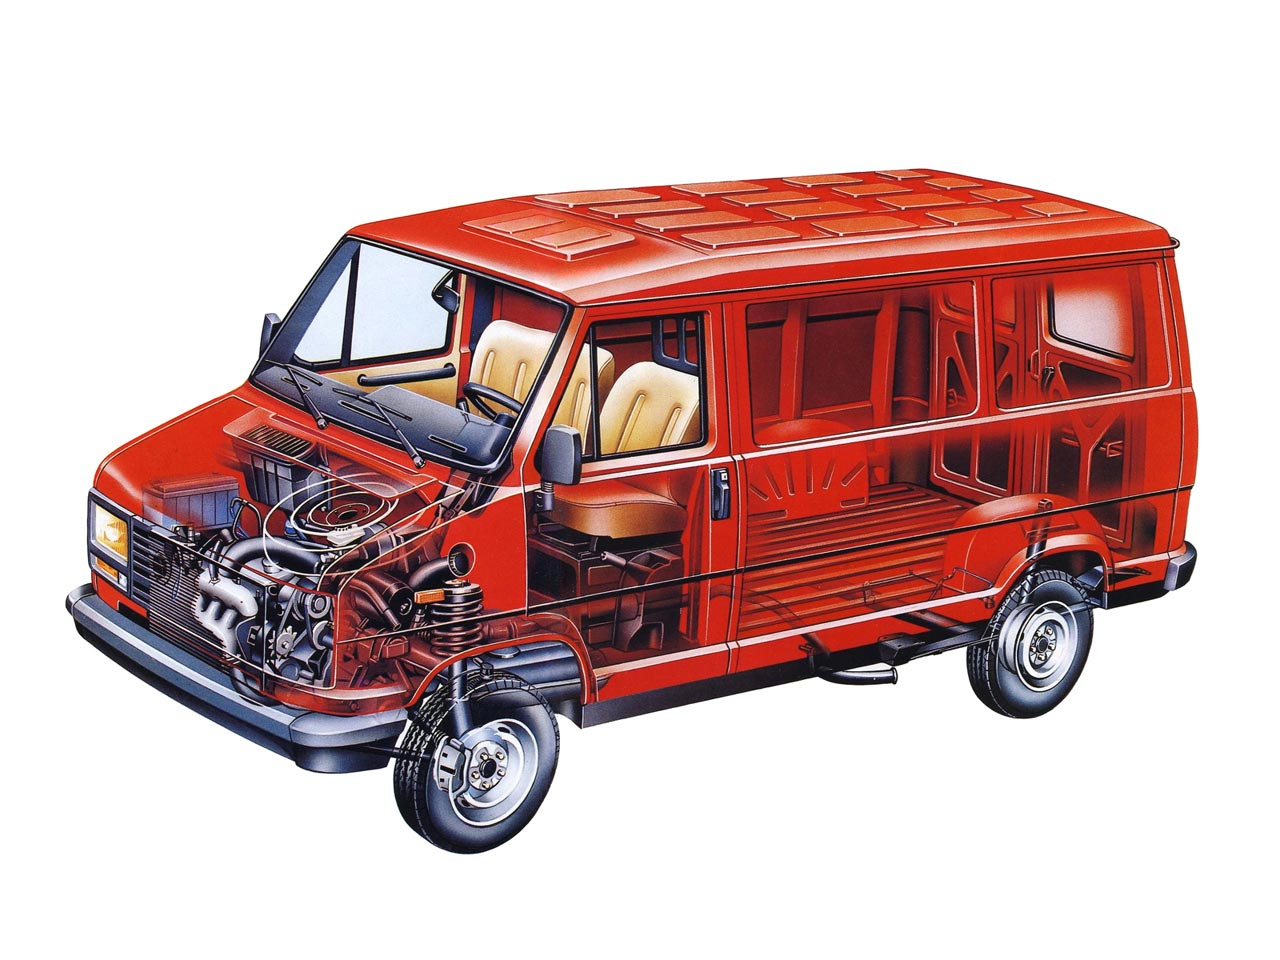 Fiat Ducato cutaway